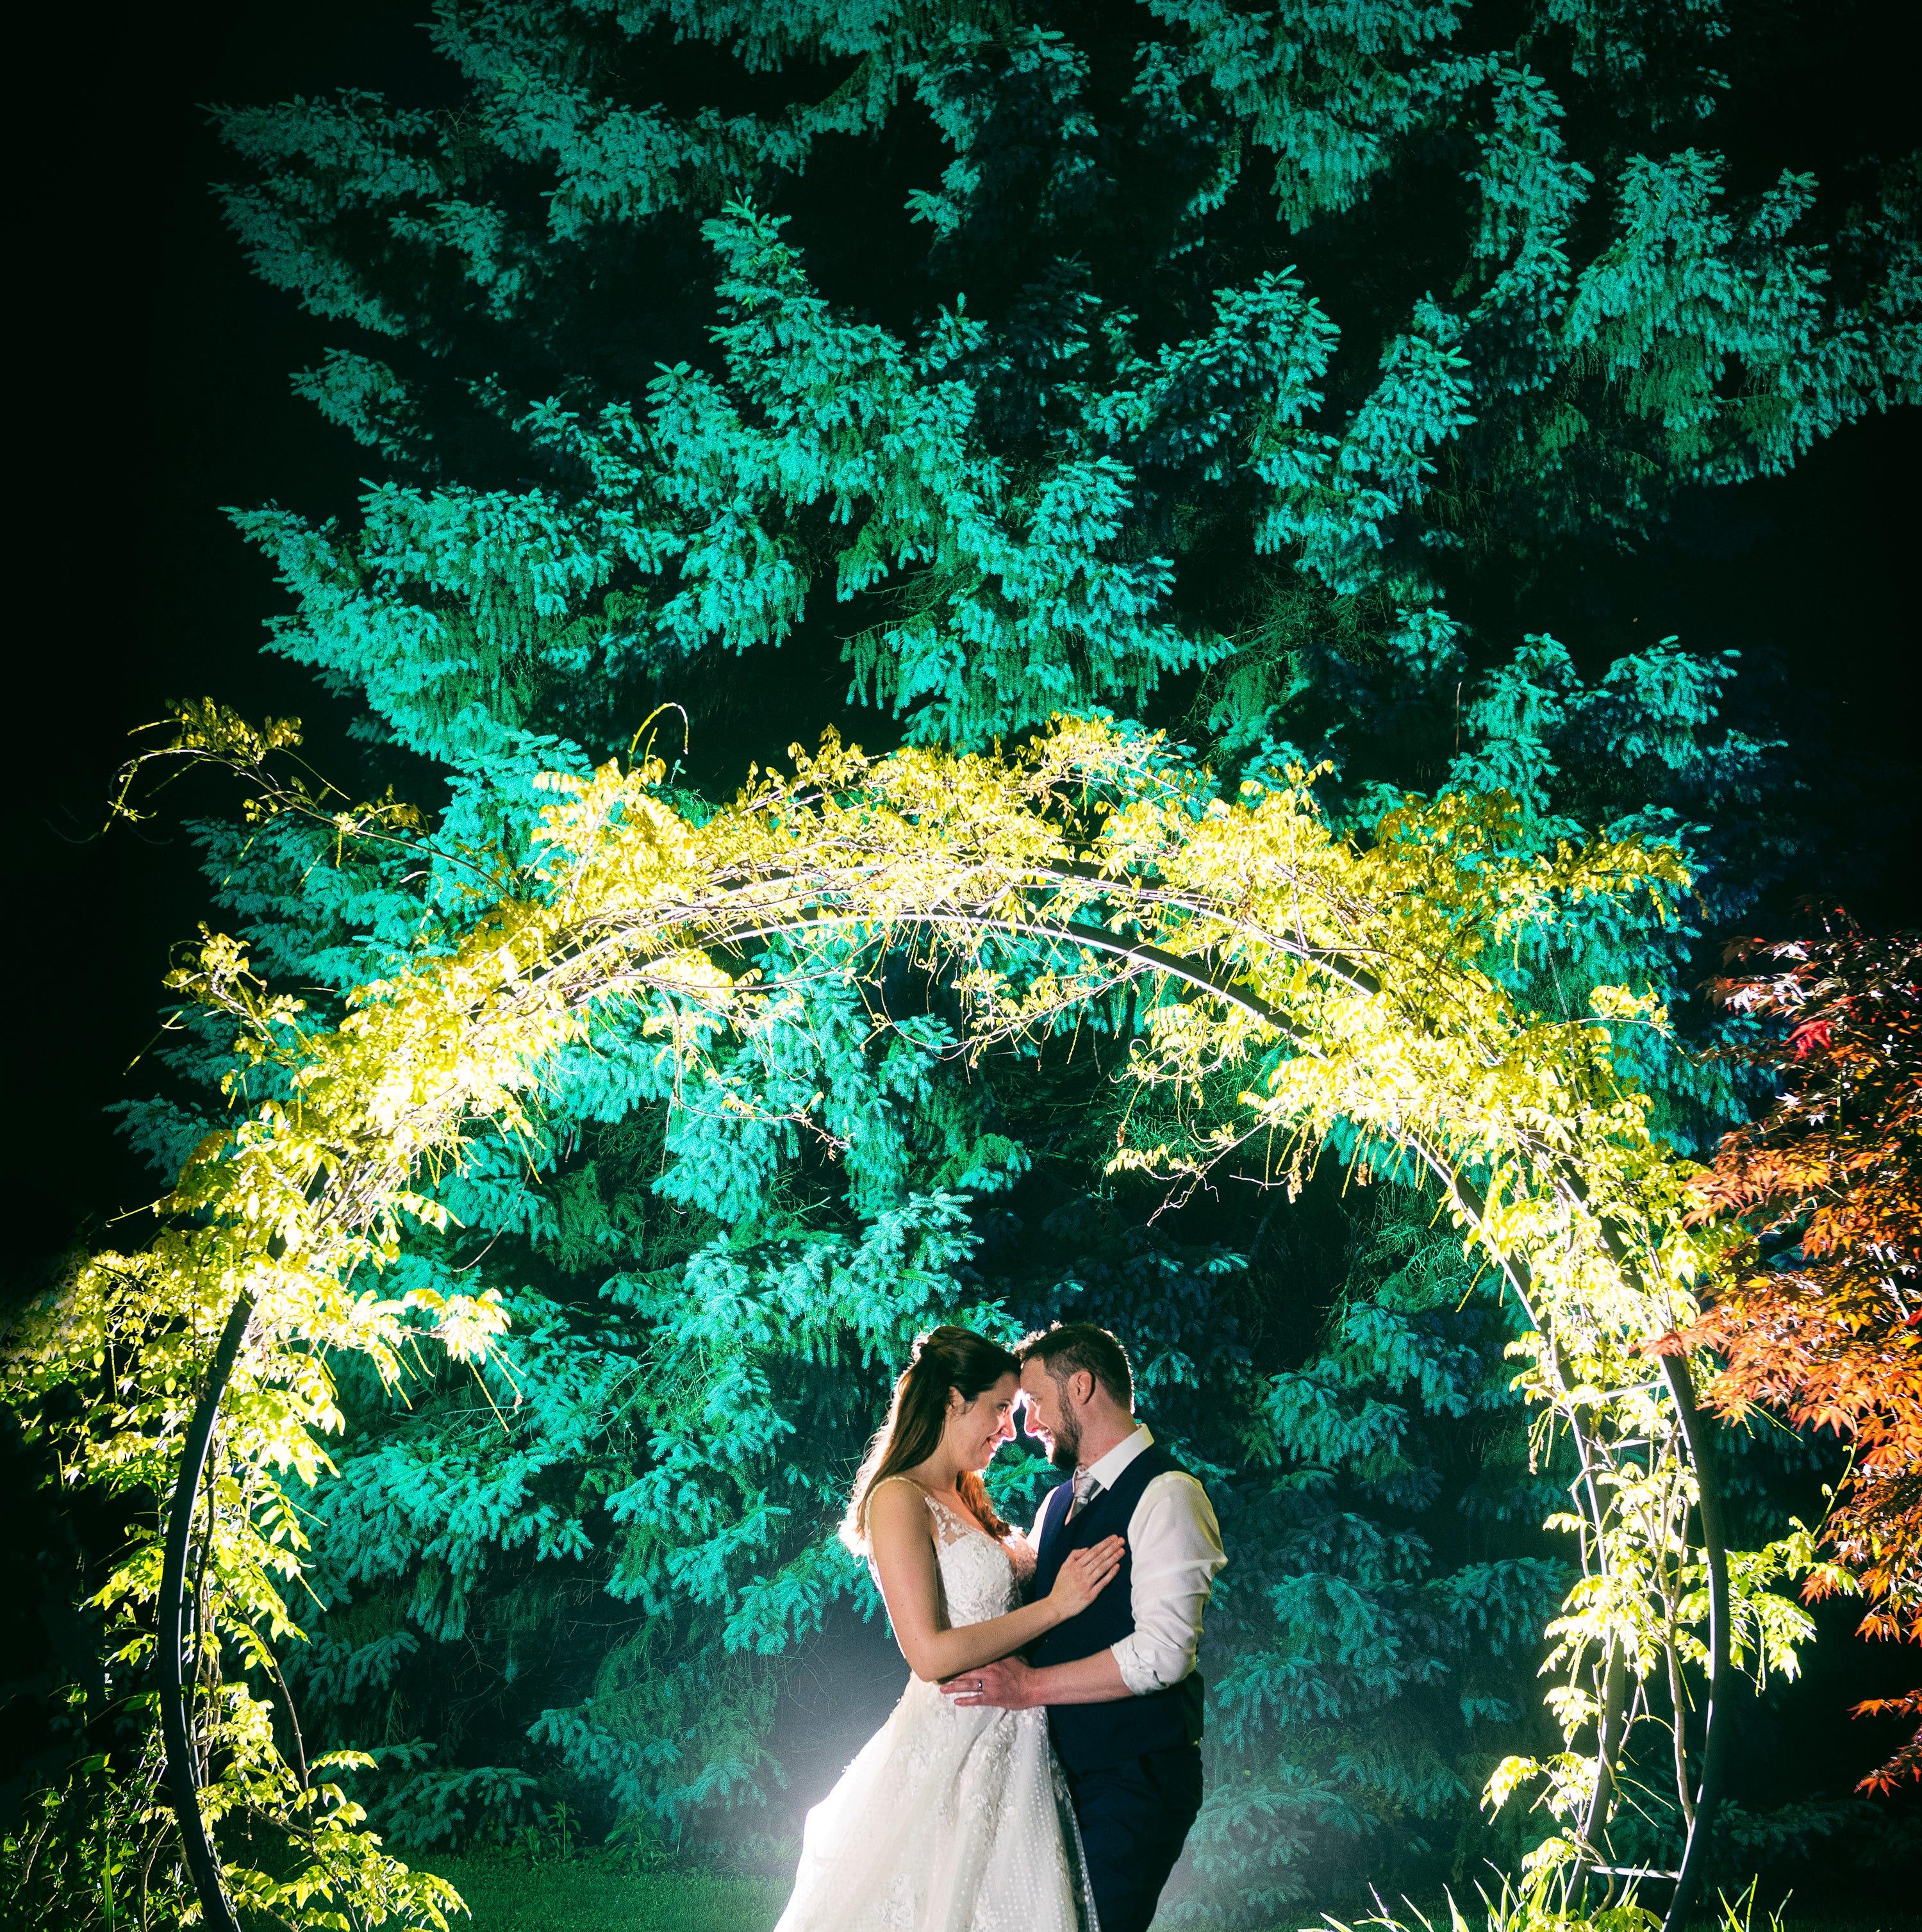 Spectacular night shots develop as Delaware wedding photographers combine skills